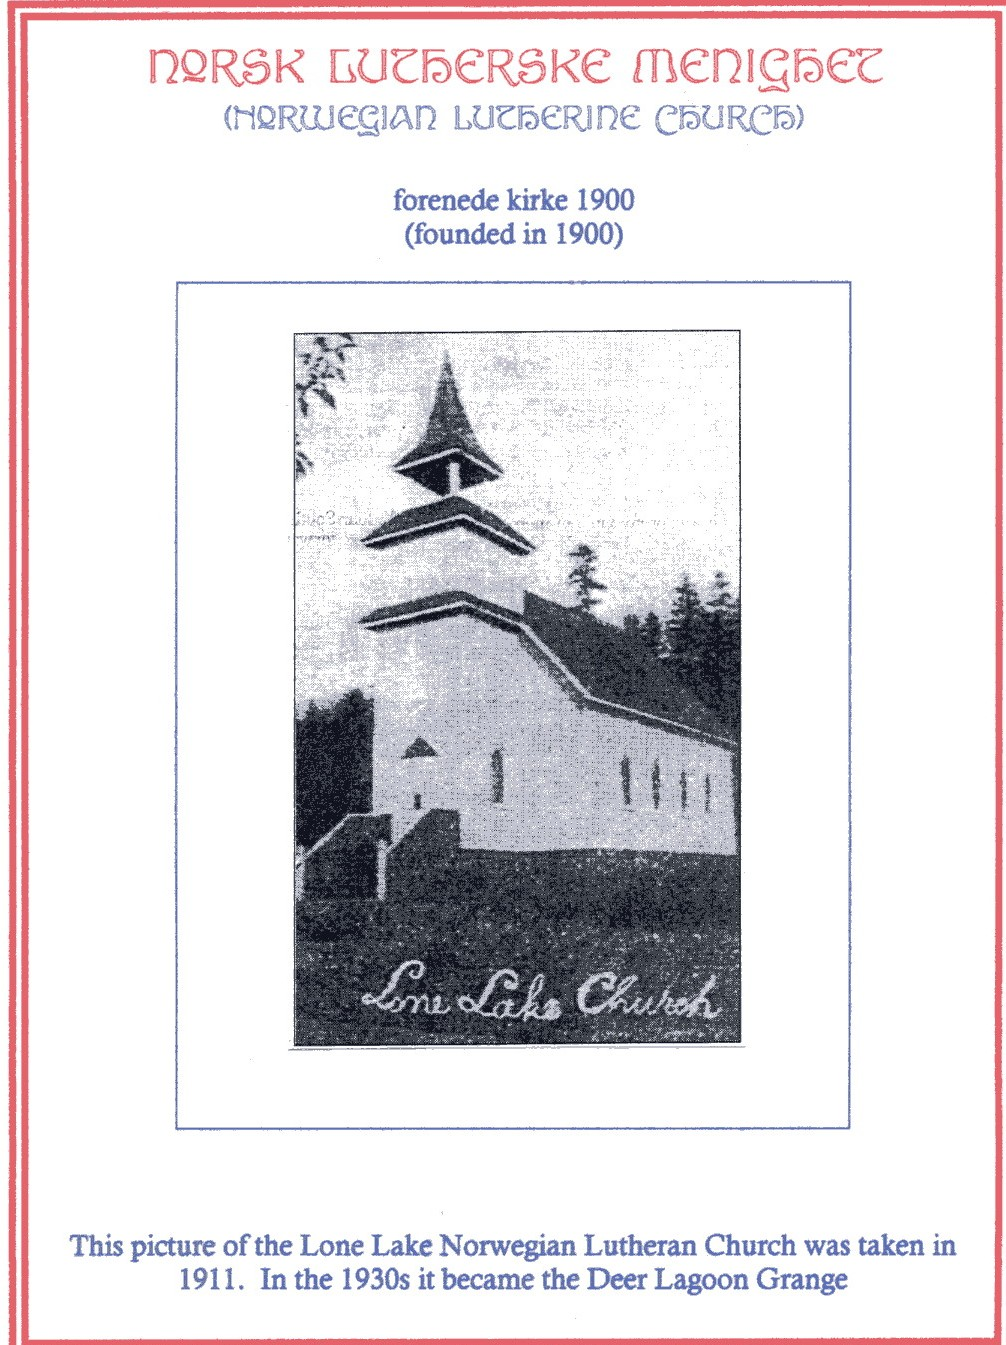 Lone Lake Lutheran Church / The Deer Lagoon Grange